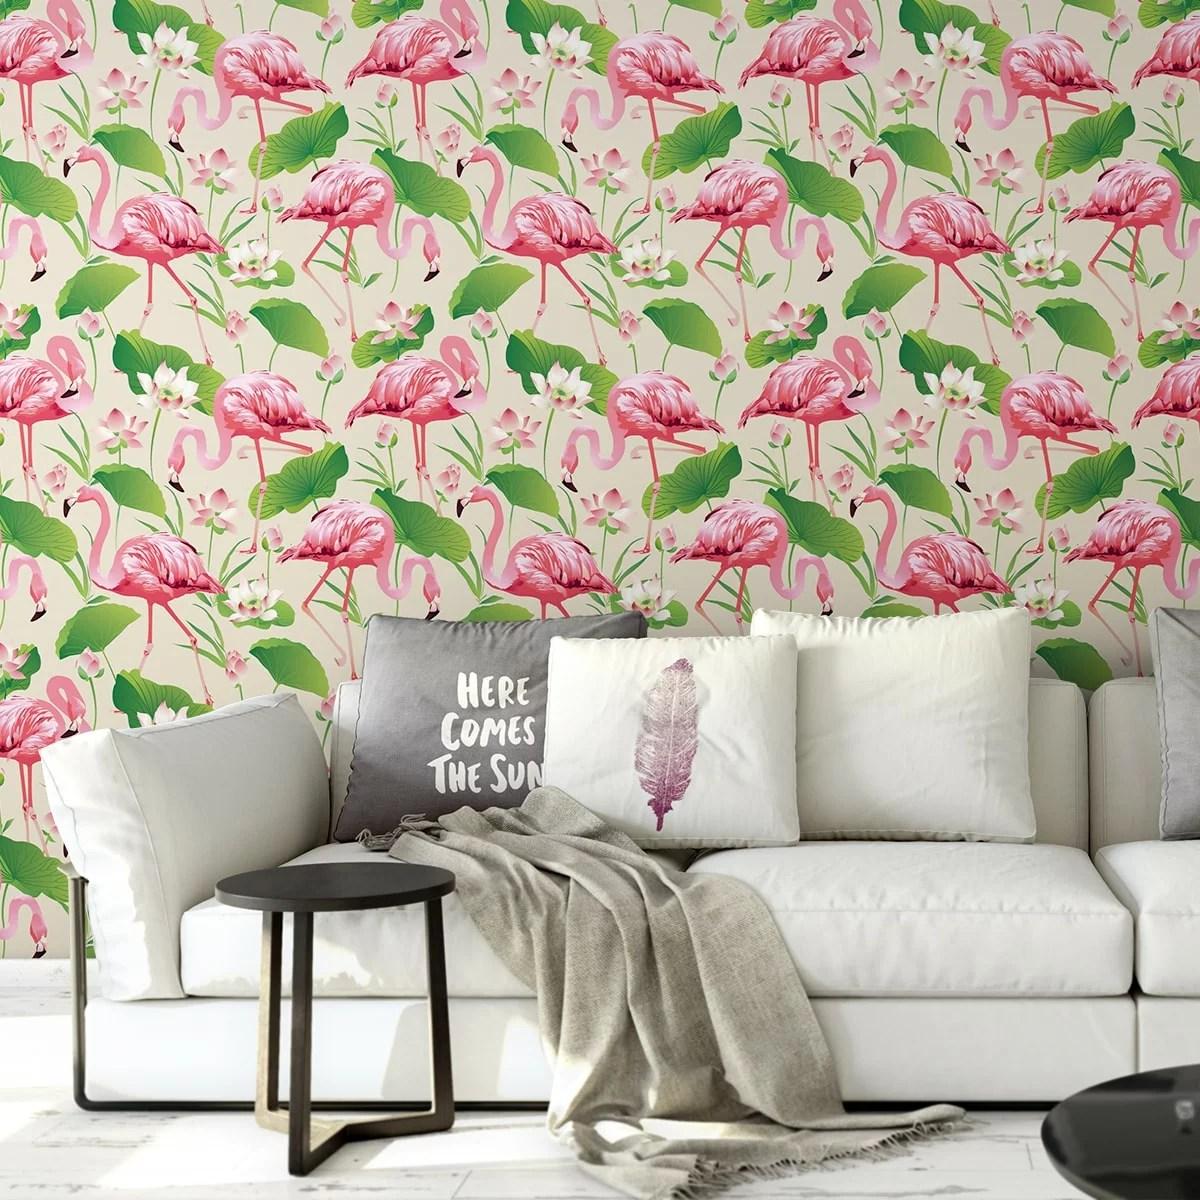 Extravagante Tapeten exotische tapete flamingo pool mit seerosen im extravaganten look